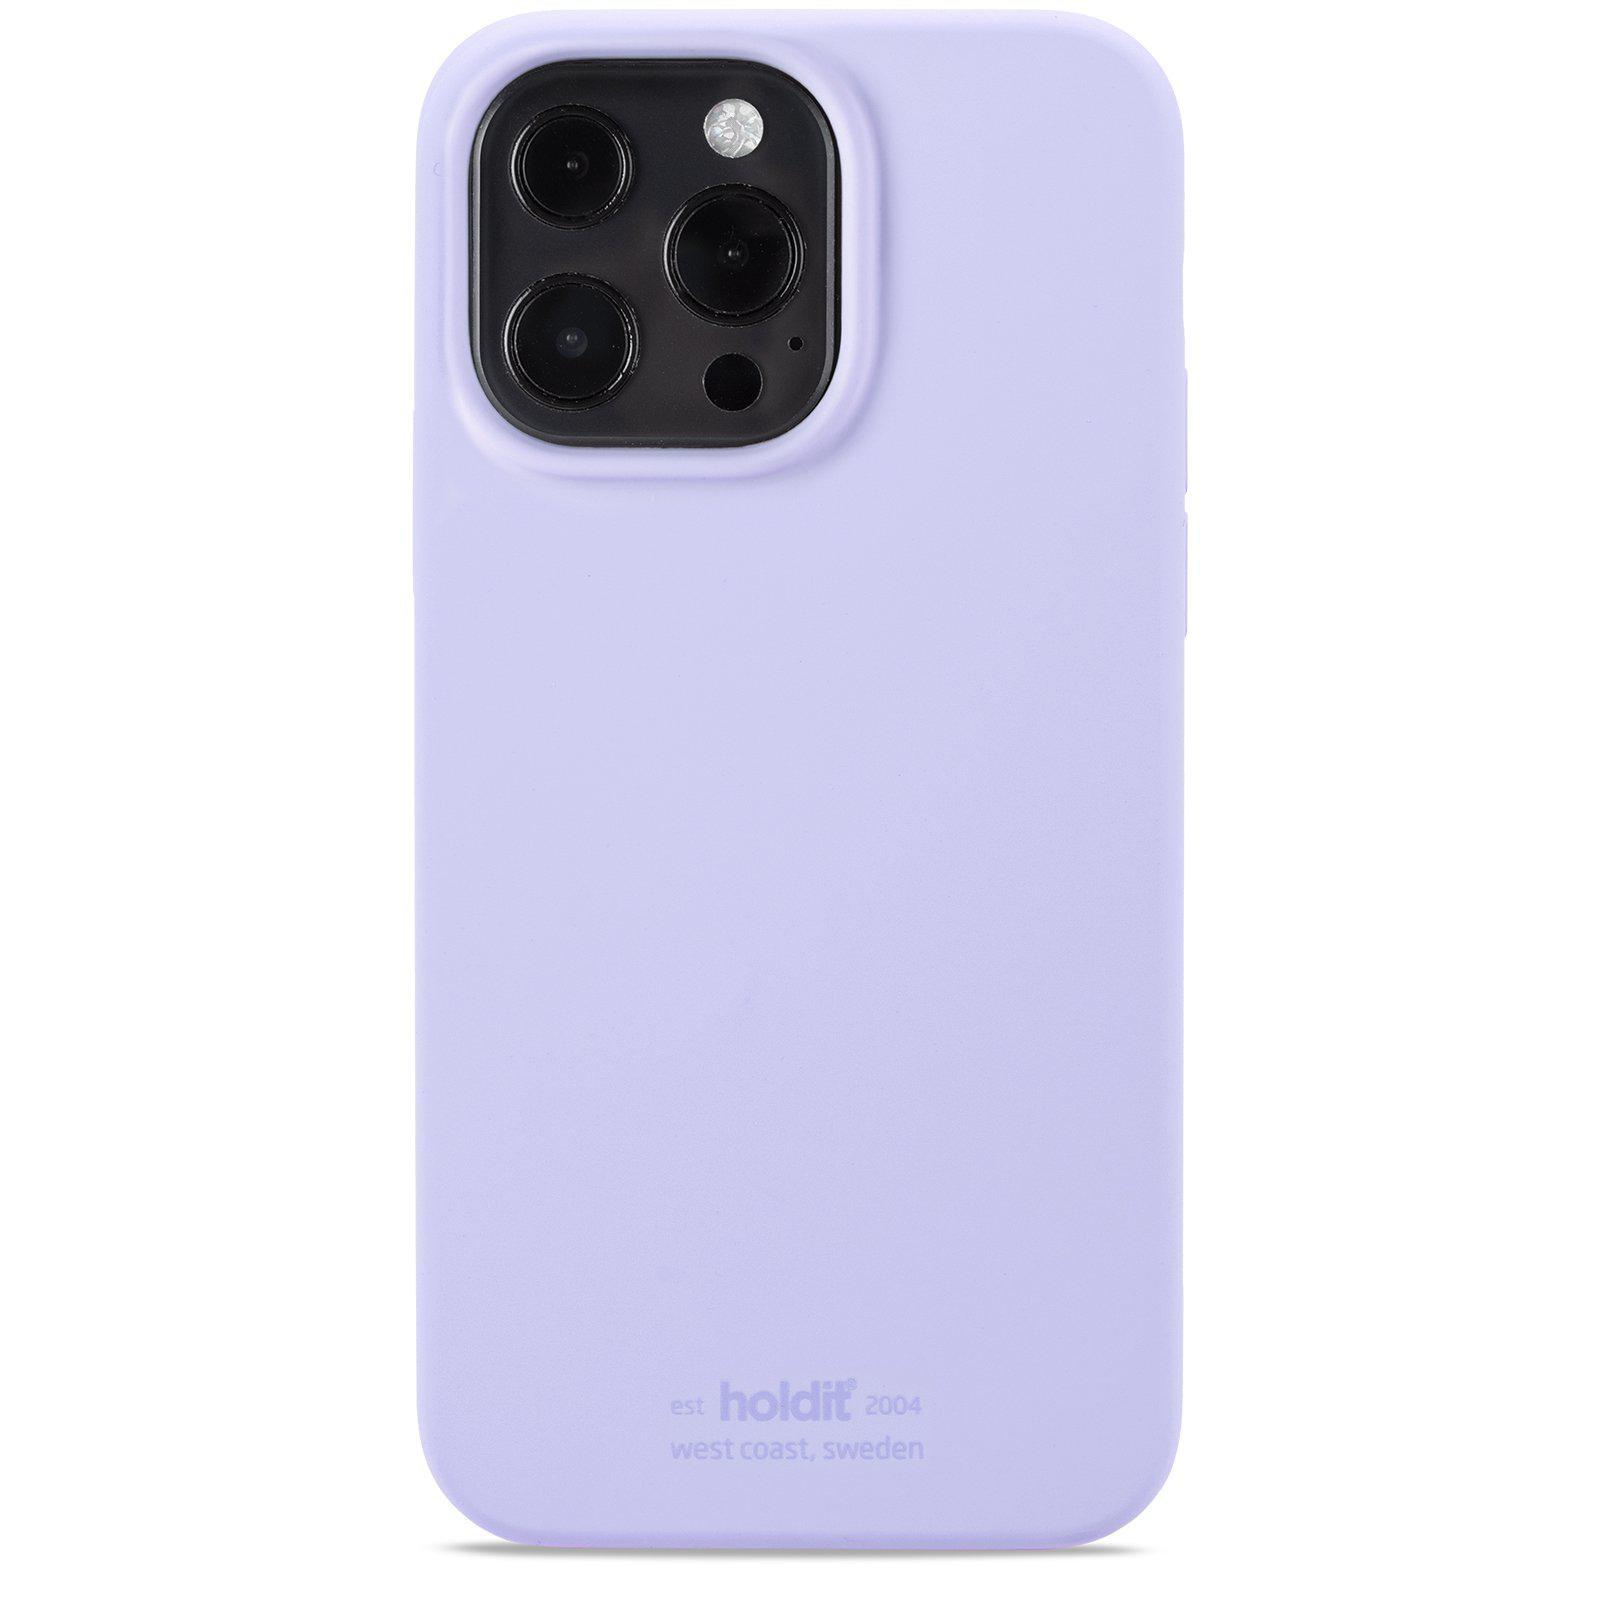 Silikonskal iPhone 13 Pro Lavender